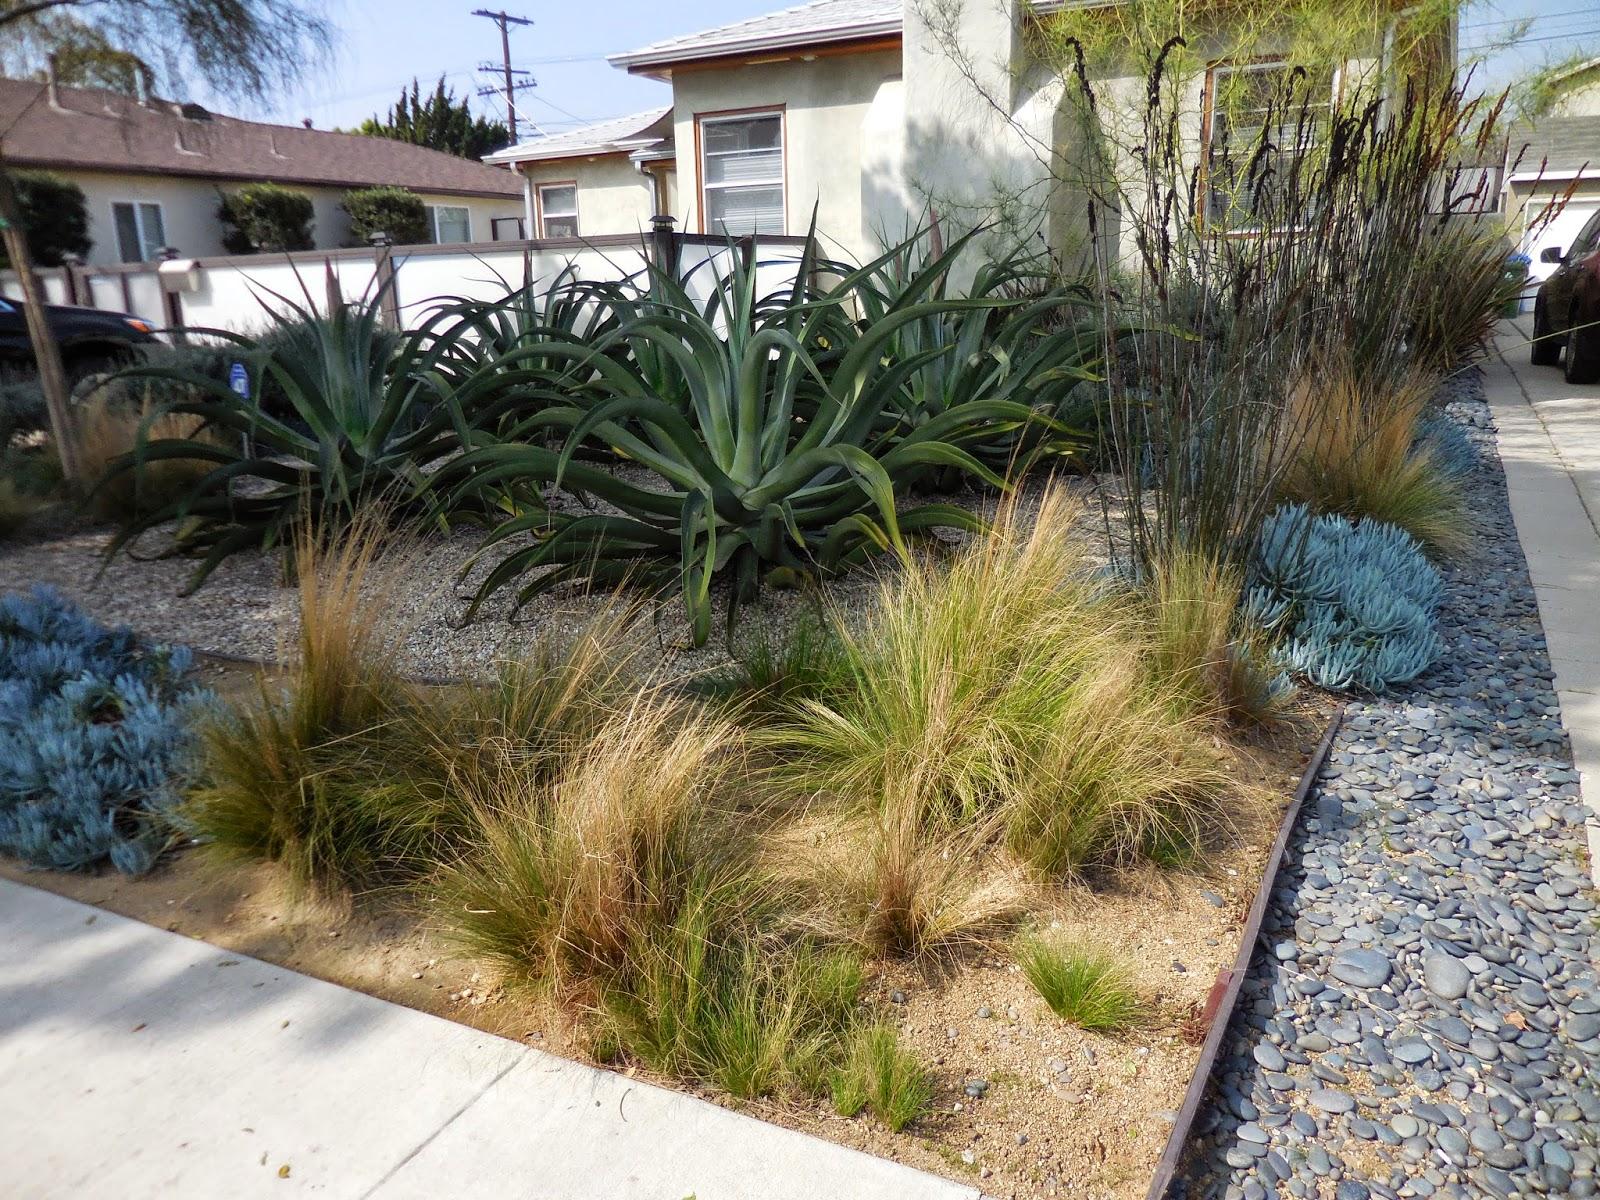 mar vista green garden showcase 12537 preston way cluster 3d